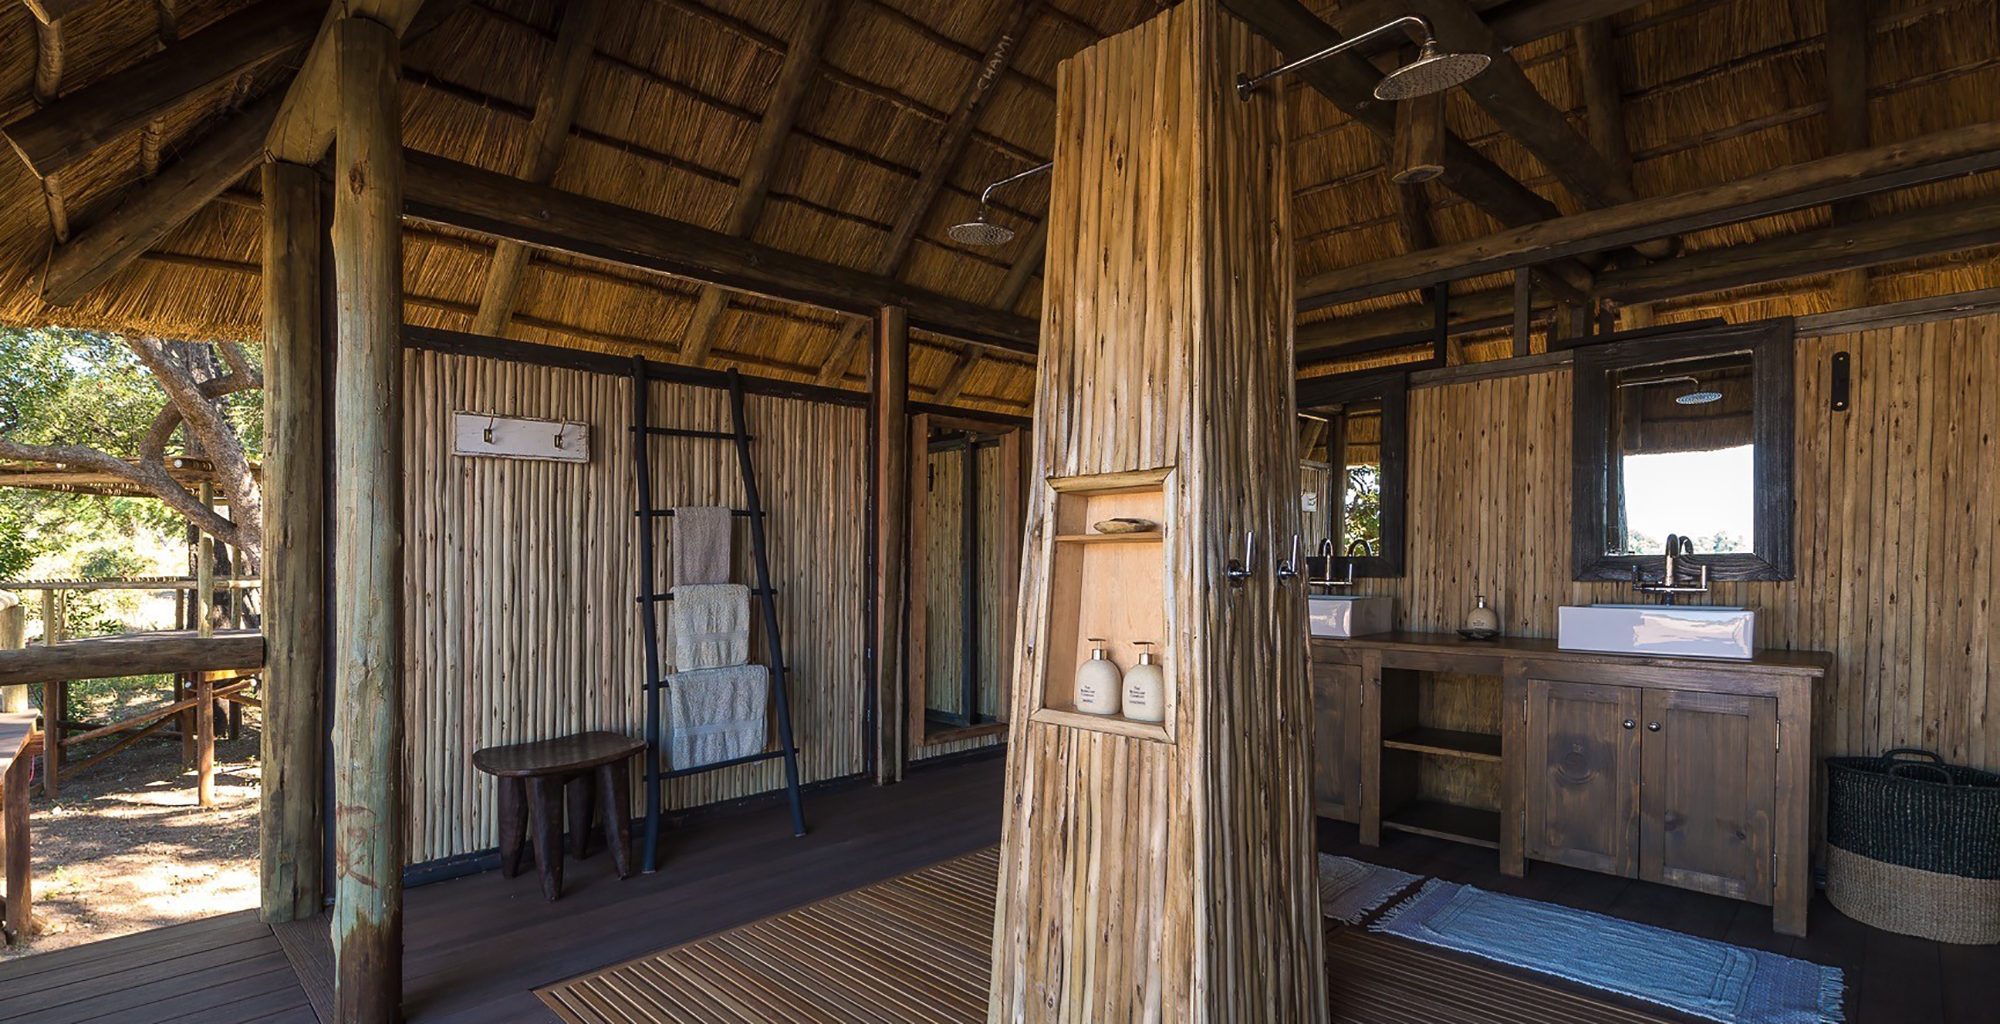 Zambia-Chamilandu-Bushcamp-Bathroom